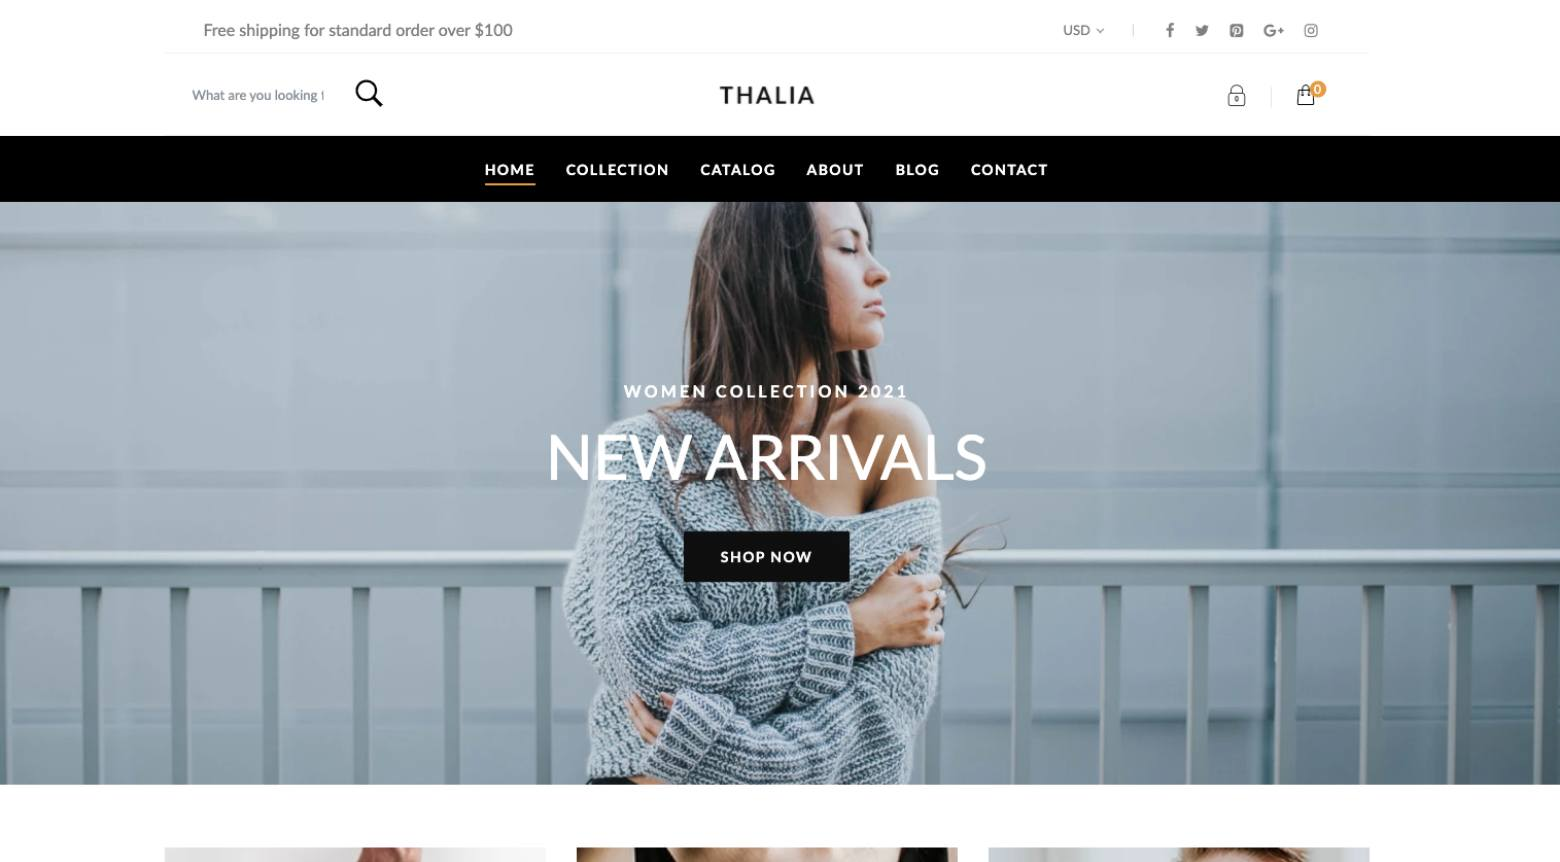 thalia shopify theme screenshot